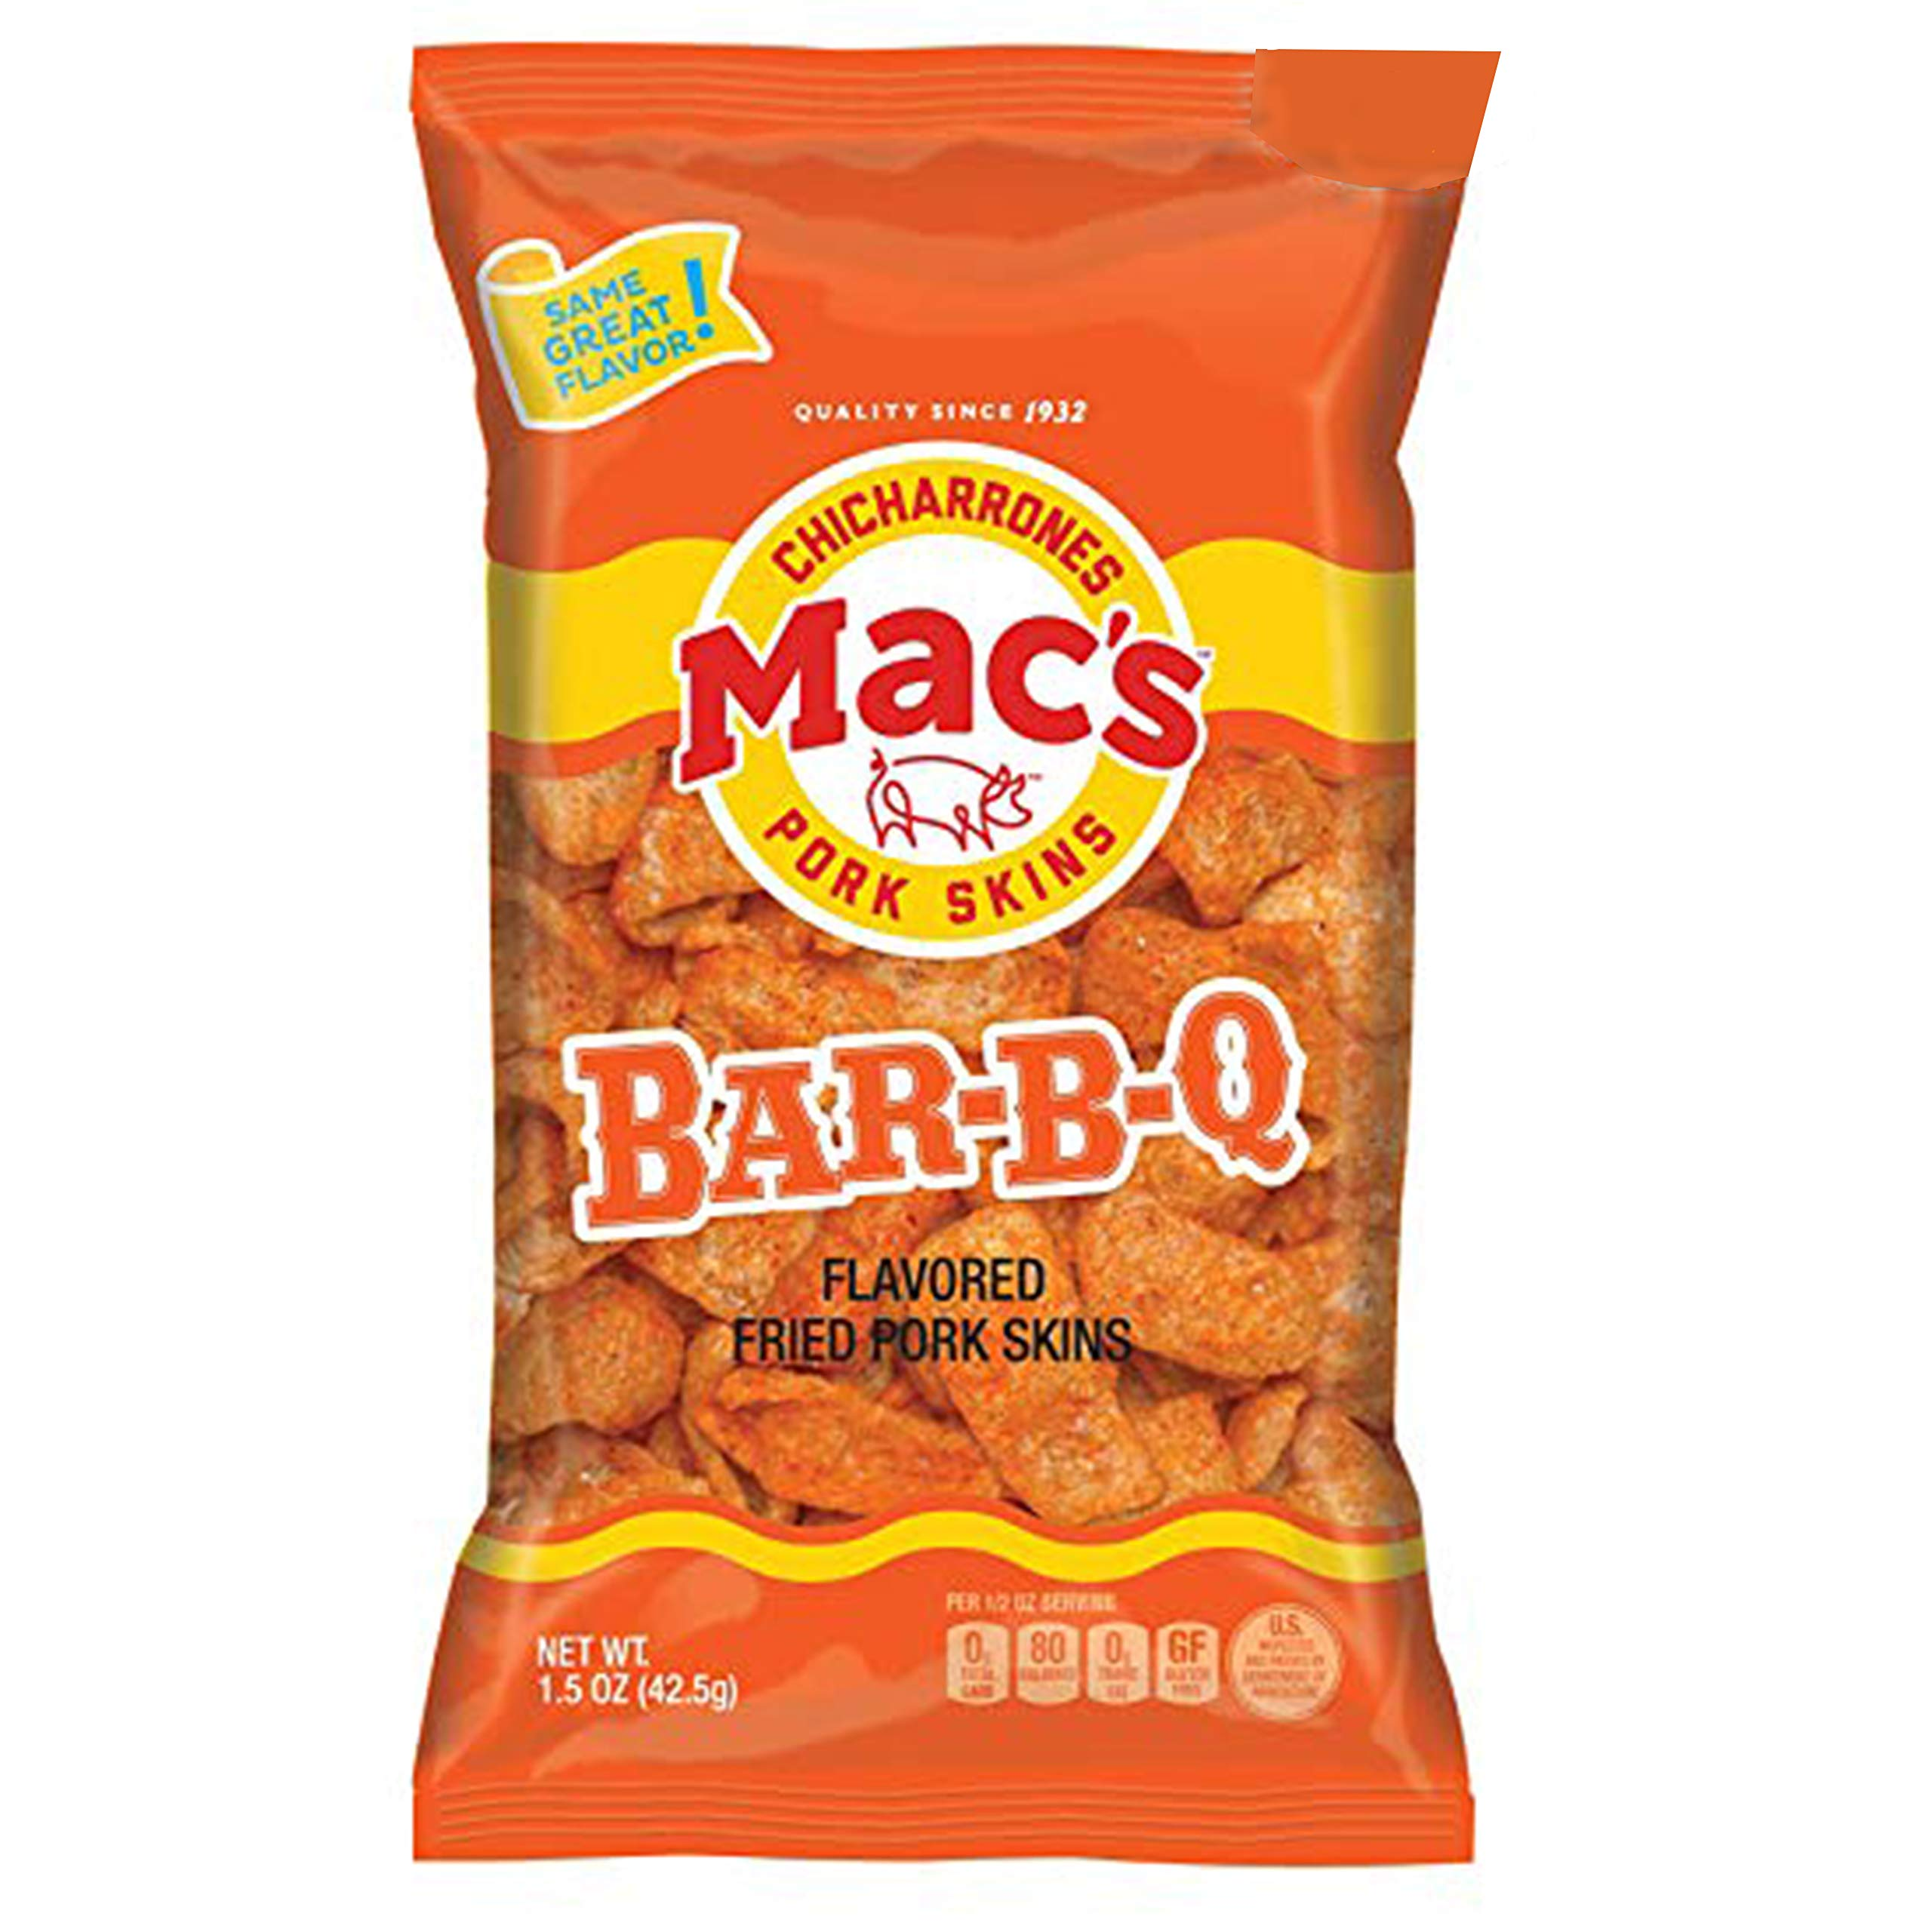 Mac's BBQ Pork Skins - Low Carb, Keto Friendly Snack - Crunchy Chicharrones/Pork Rinds (5 oz bags, 2ct)